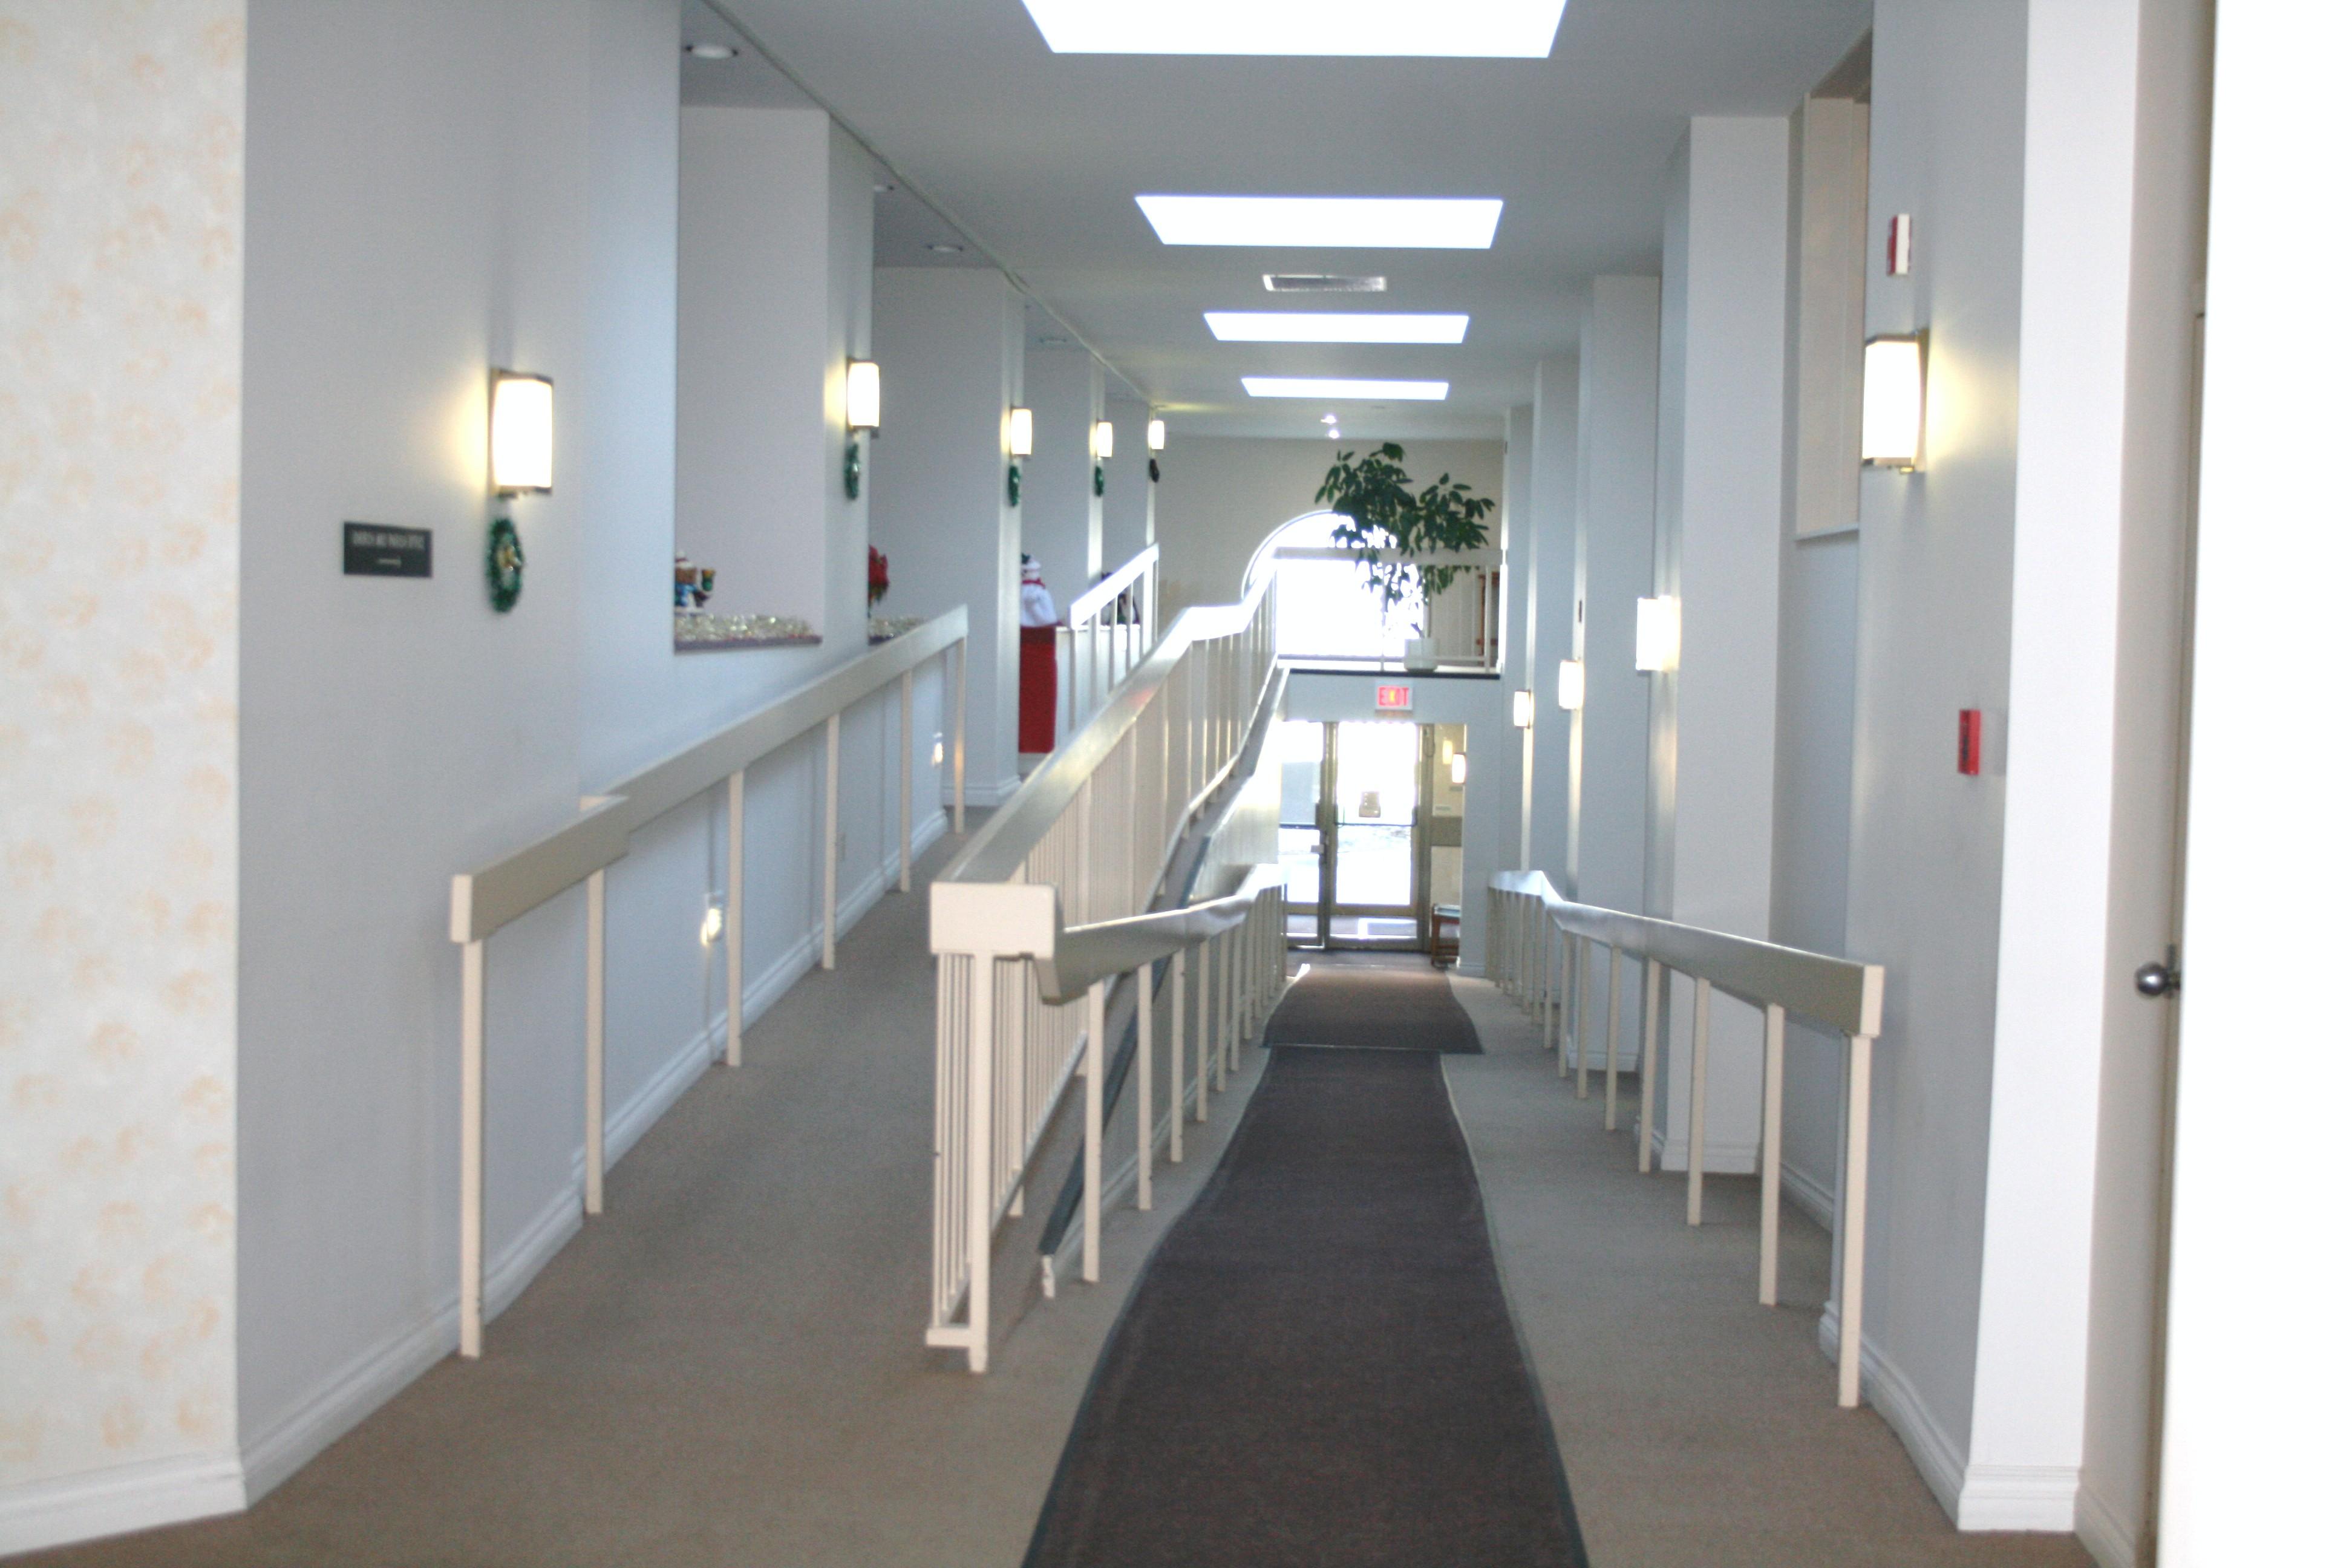 Entrance ramp